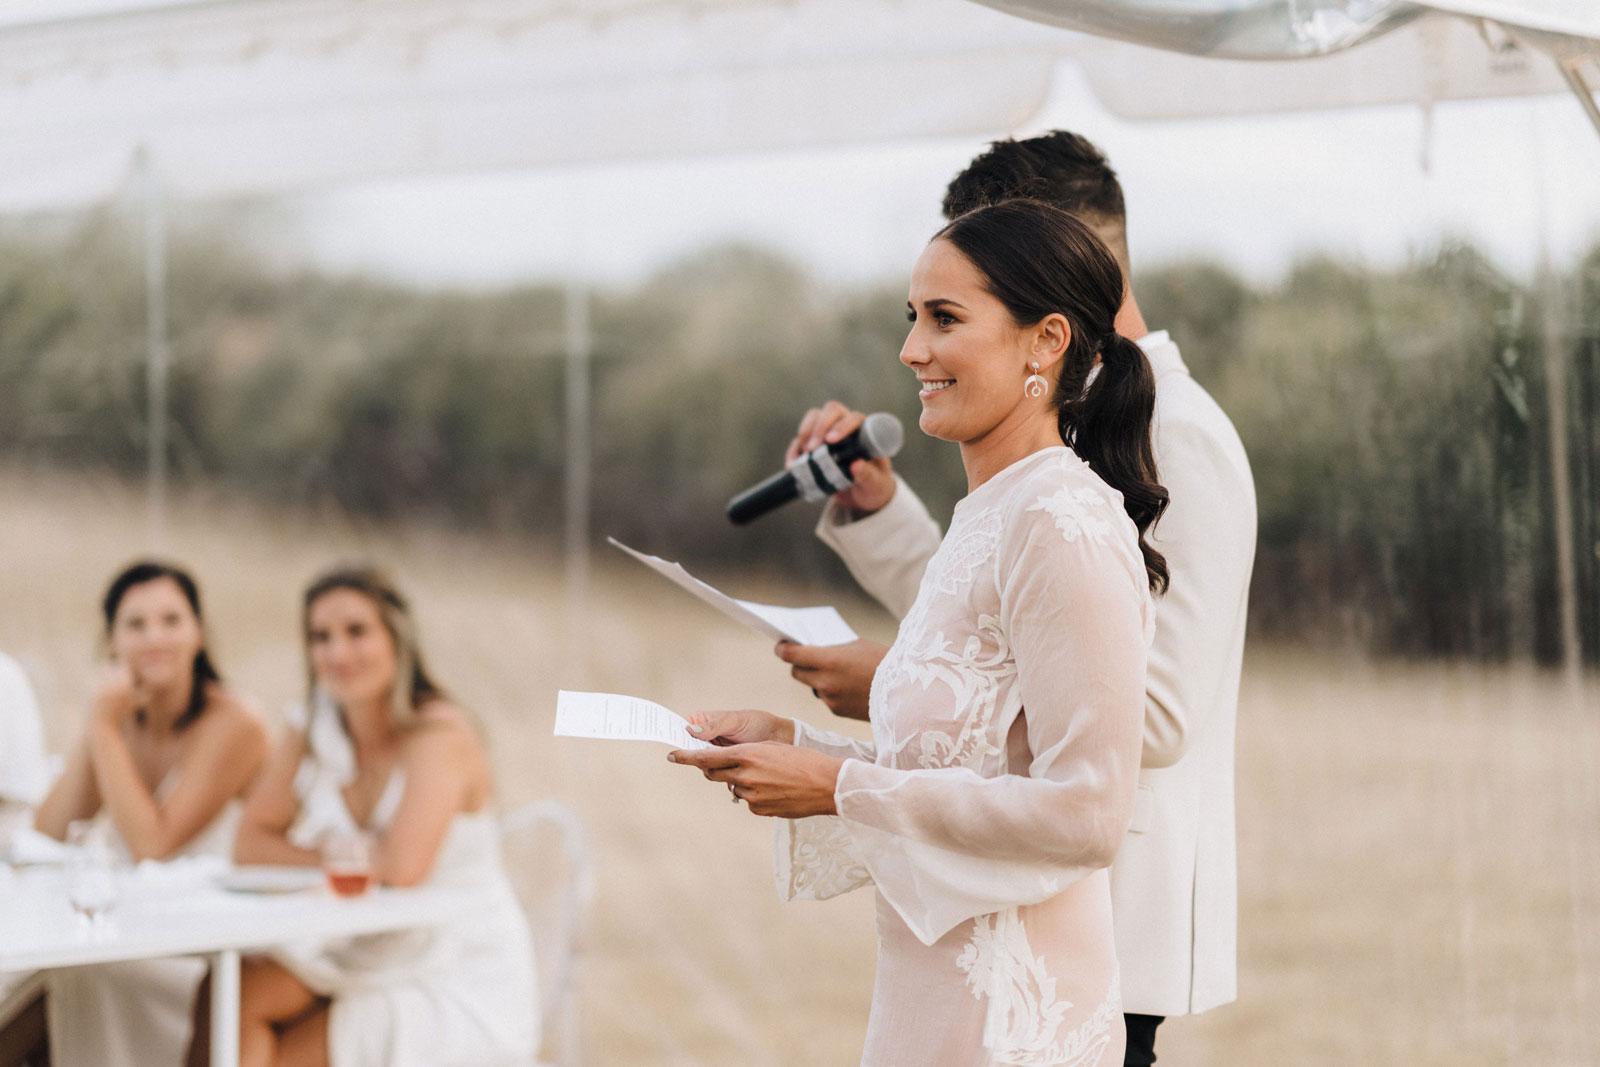 newfound-s-t-hunua-auckland-wedding-photographers-092